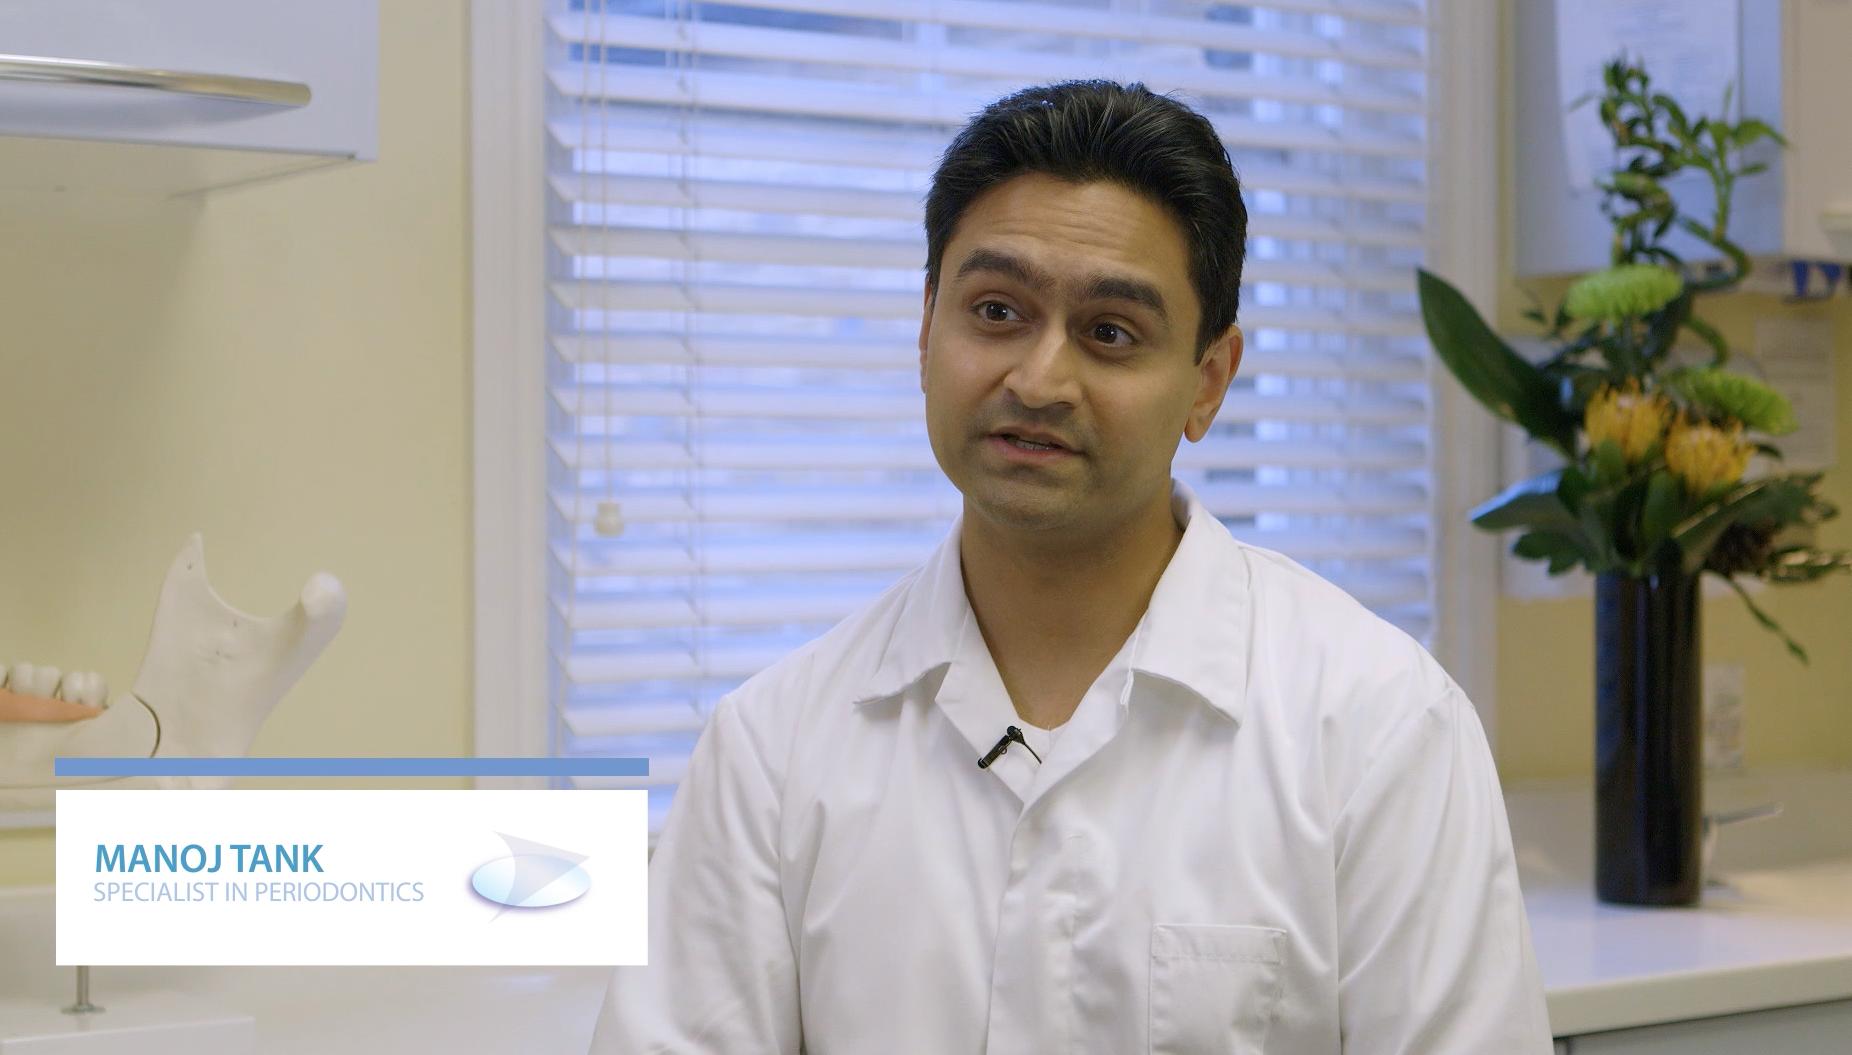 Manoj Tank, Specialist in periodontics, talks about gum health